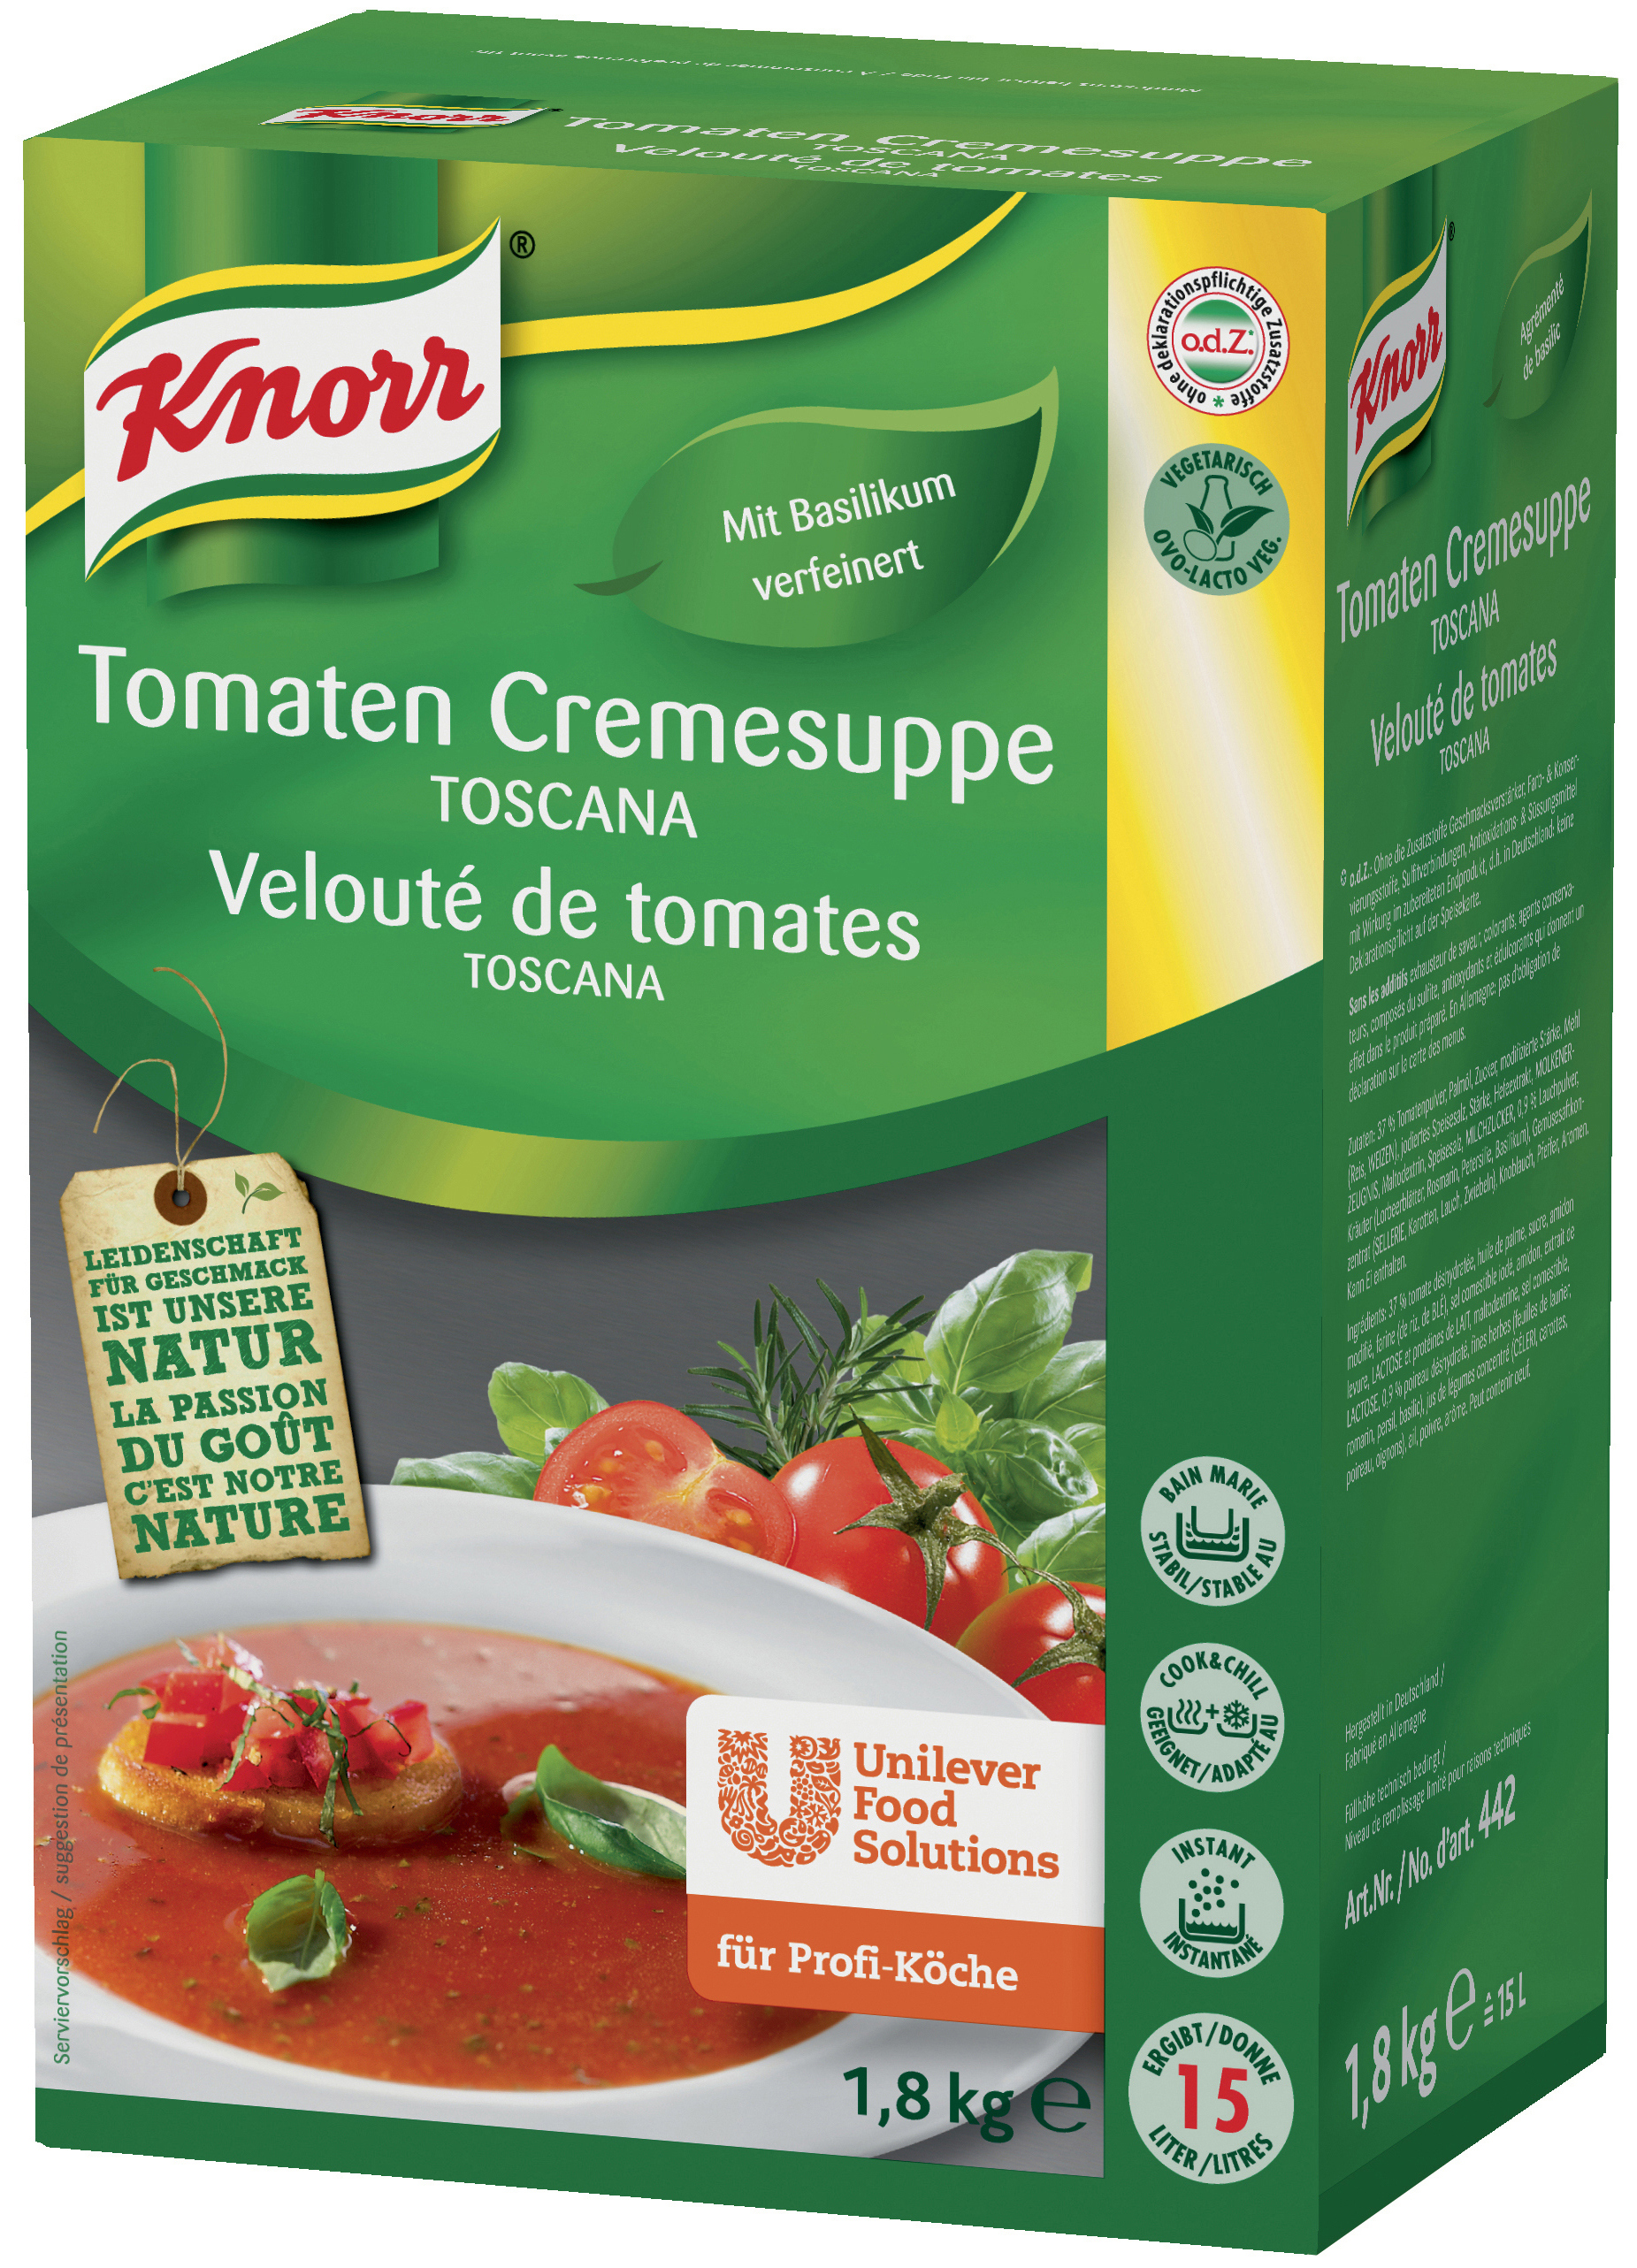 Knorr Tomaten Cremesuppe Toscana 1800 g